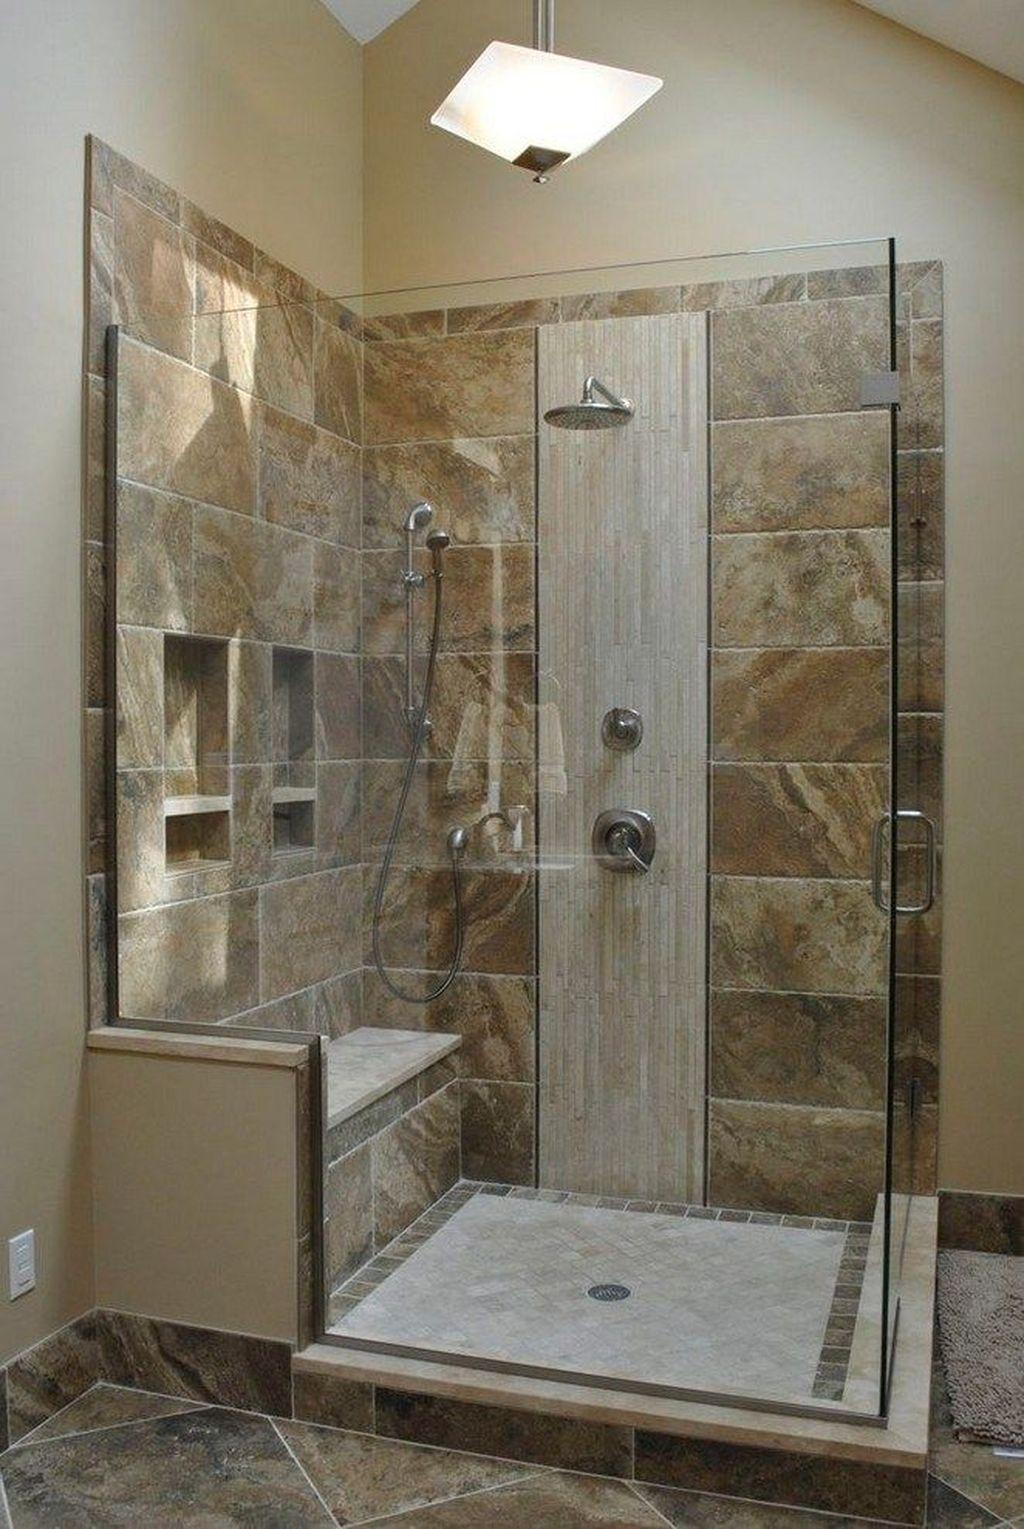 33 Trendy Basement Bathroom Ideas: 33 Awesome Small Bathroom Makeovers Ideas On A Budget